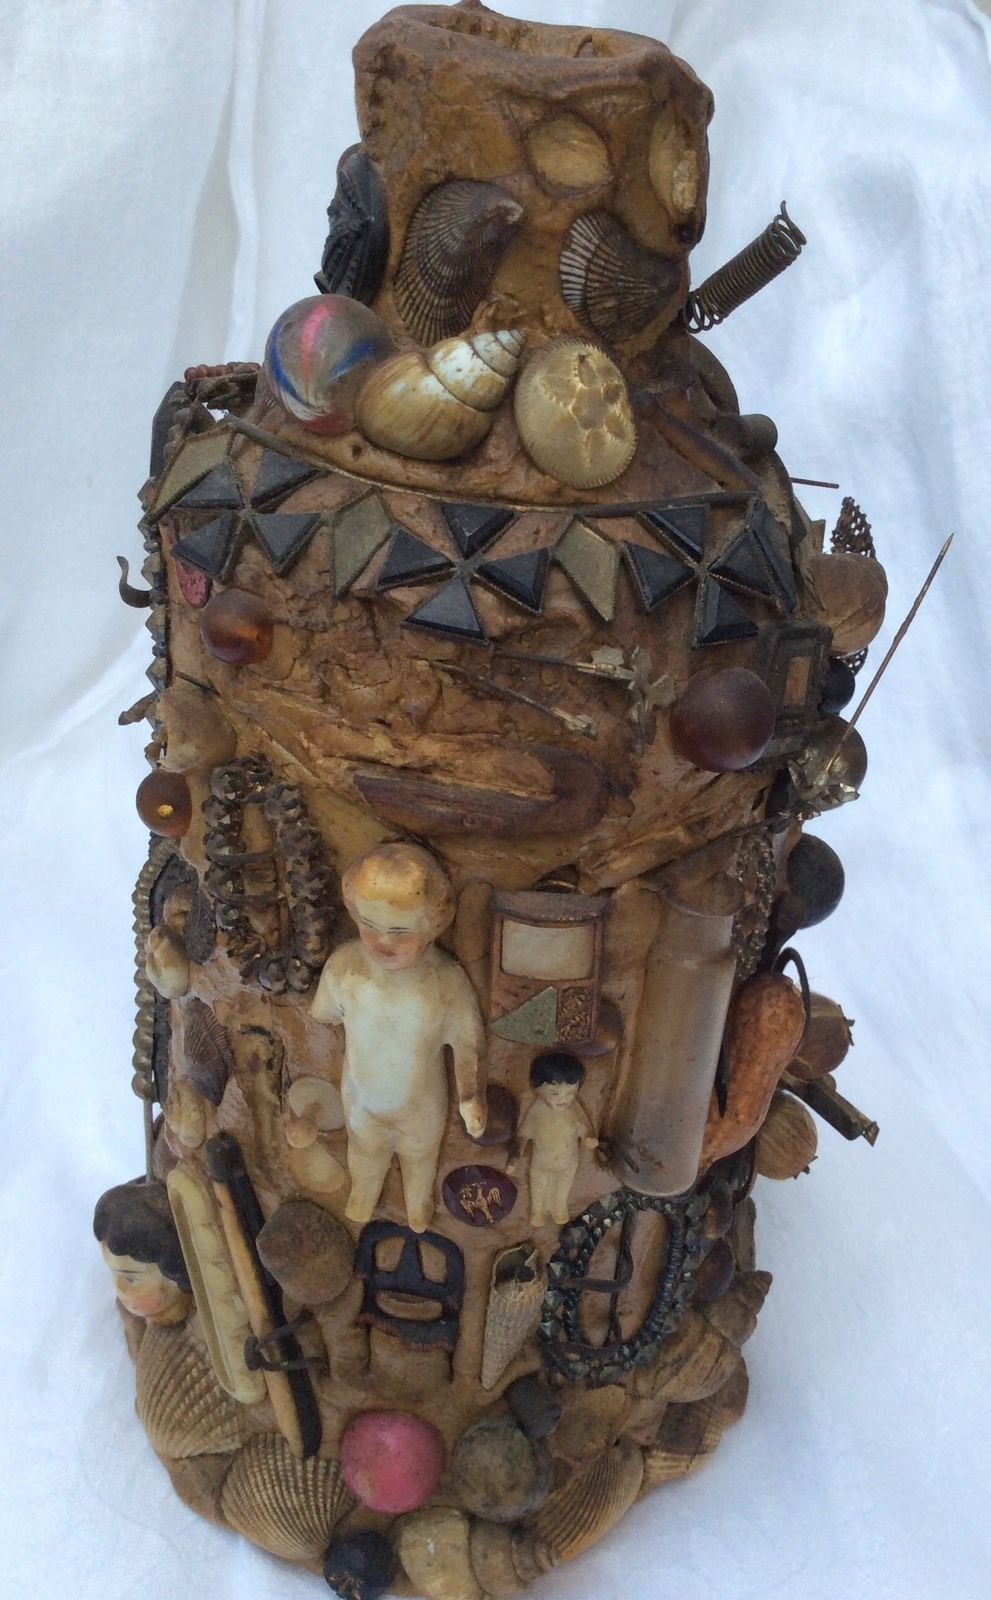 Antique Folk Art Pottery Memory Jug Crock Bisque Doll Marbles Knife Buttons More Pottery Art Antique Folk Art Bisque Doll